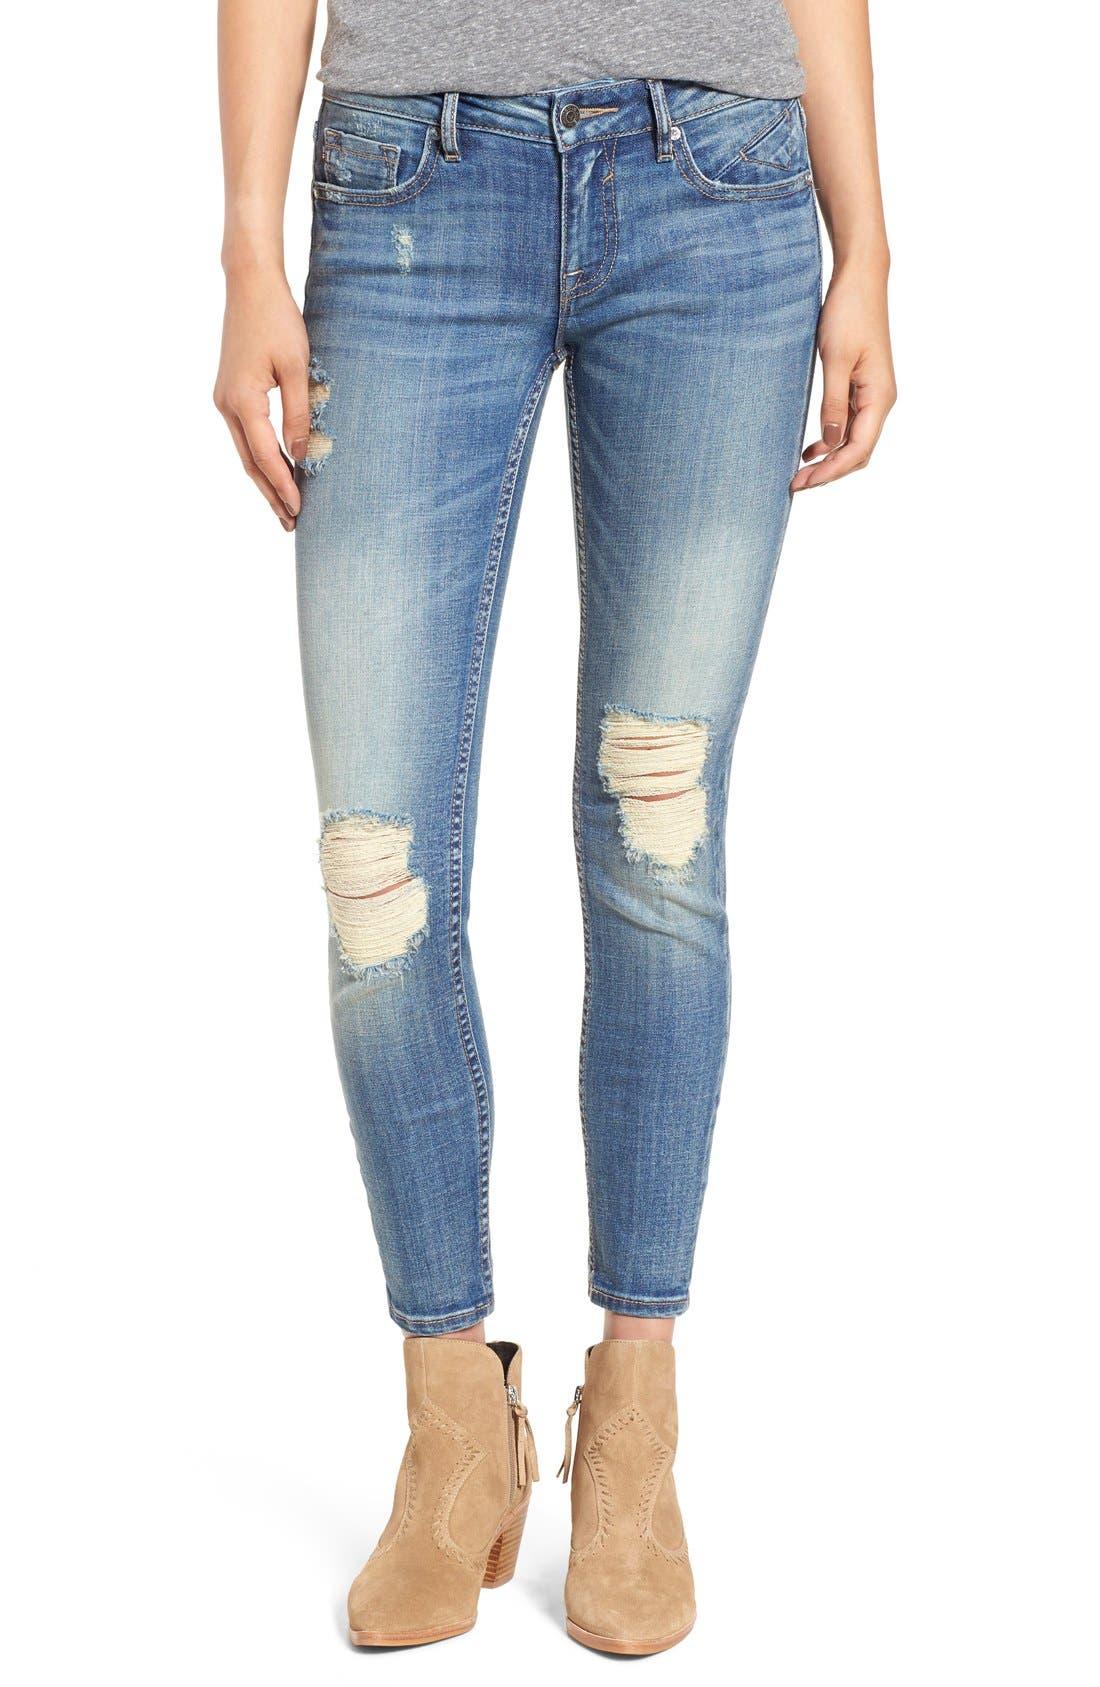 Alternate Image 1 Selected - Vigoss 'Chelsea' Destroyed Ankle Skinny Jeans